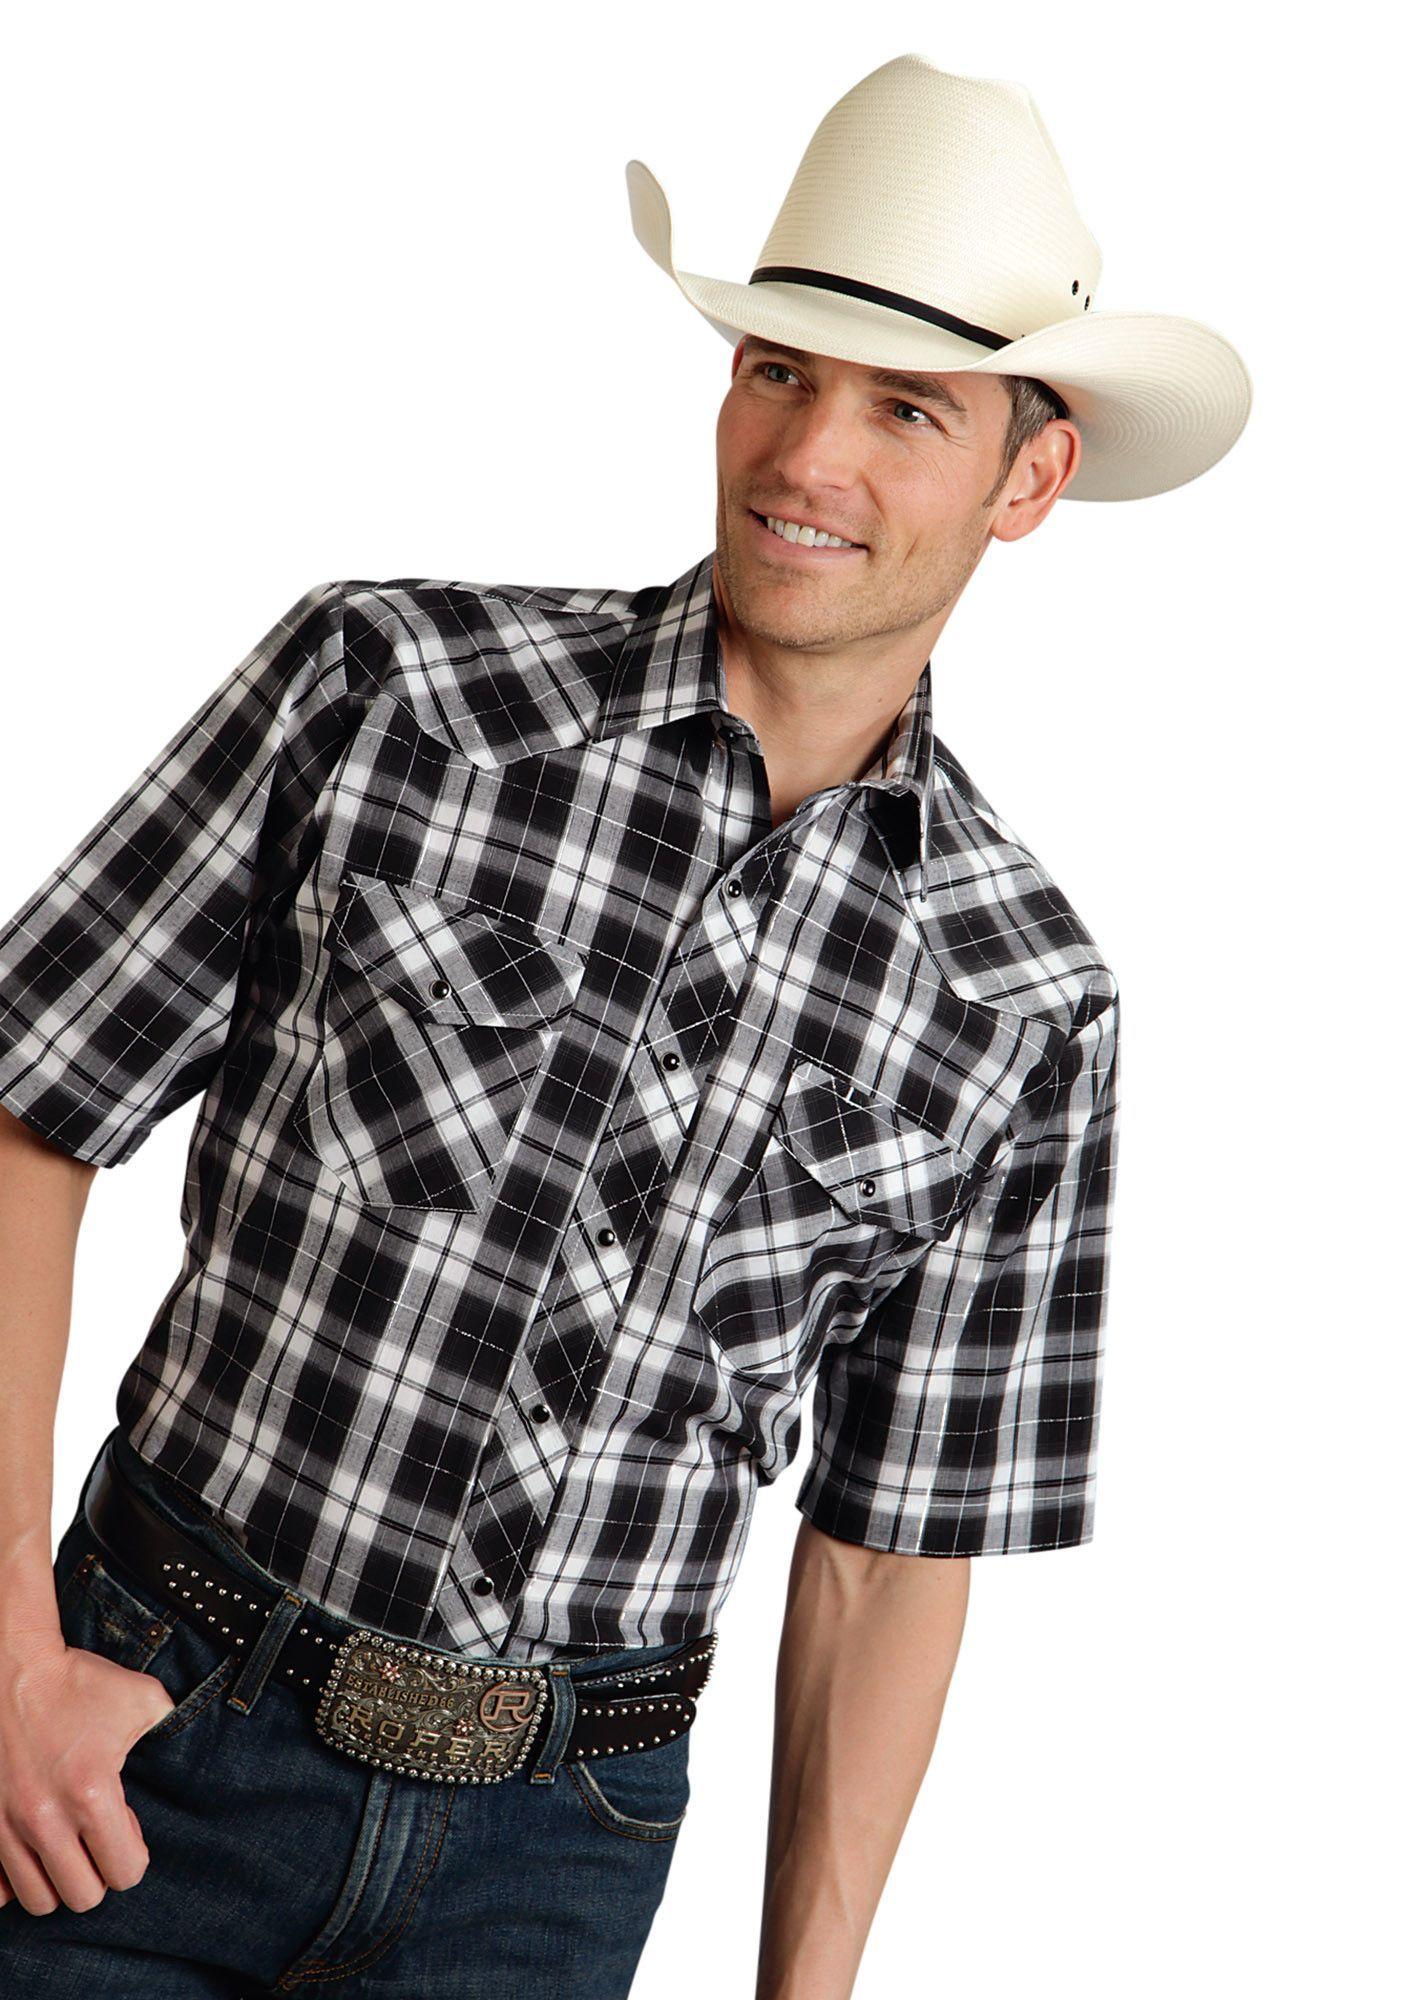 de61ab83 Roper Mens 9670 Big Bl & Wh Plaid W/silver Lining Poly Cotton 55/45 Plaids  Short Sleeve Shirt Snap Closure - 2 Pocket